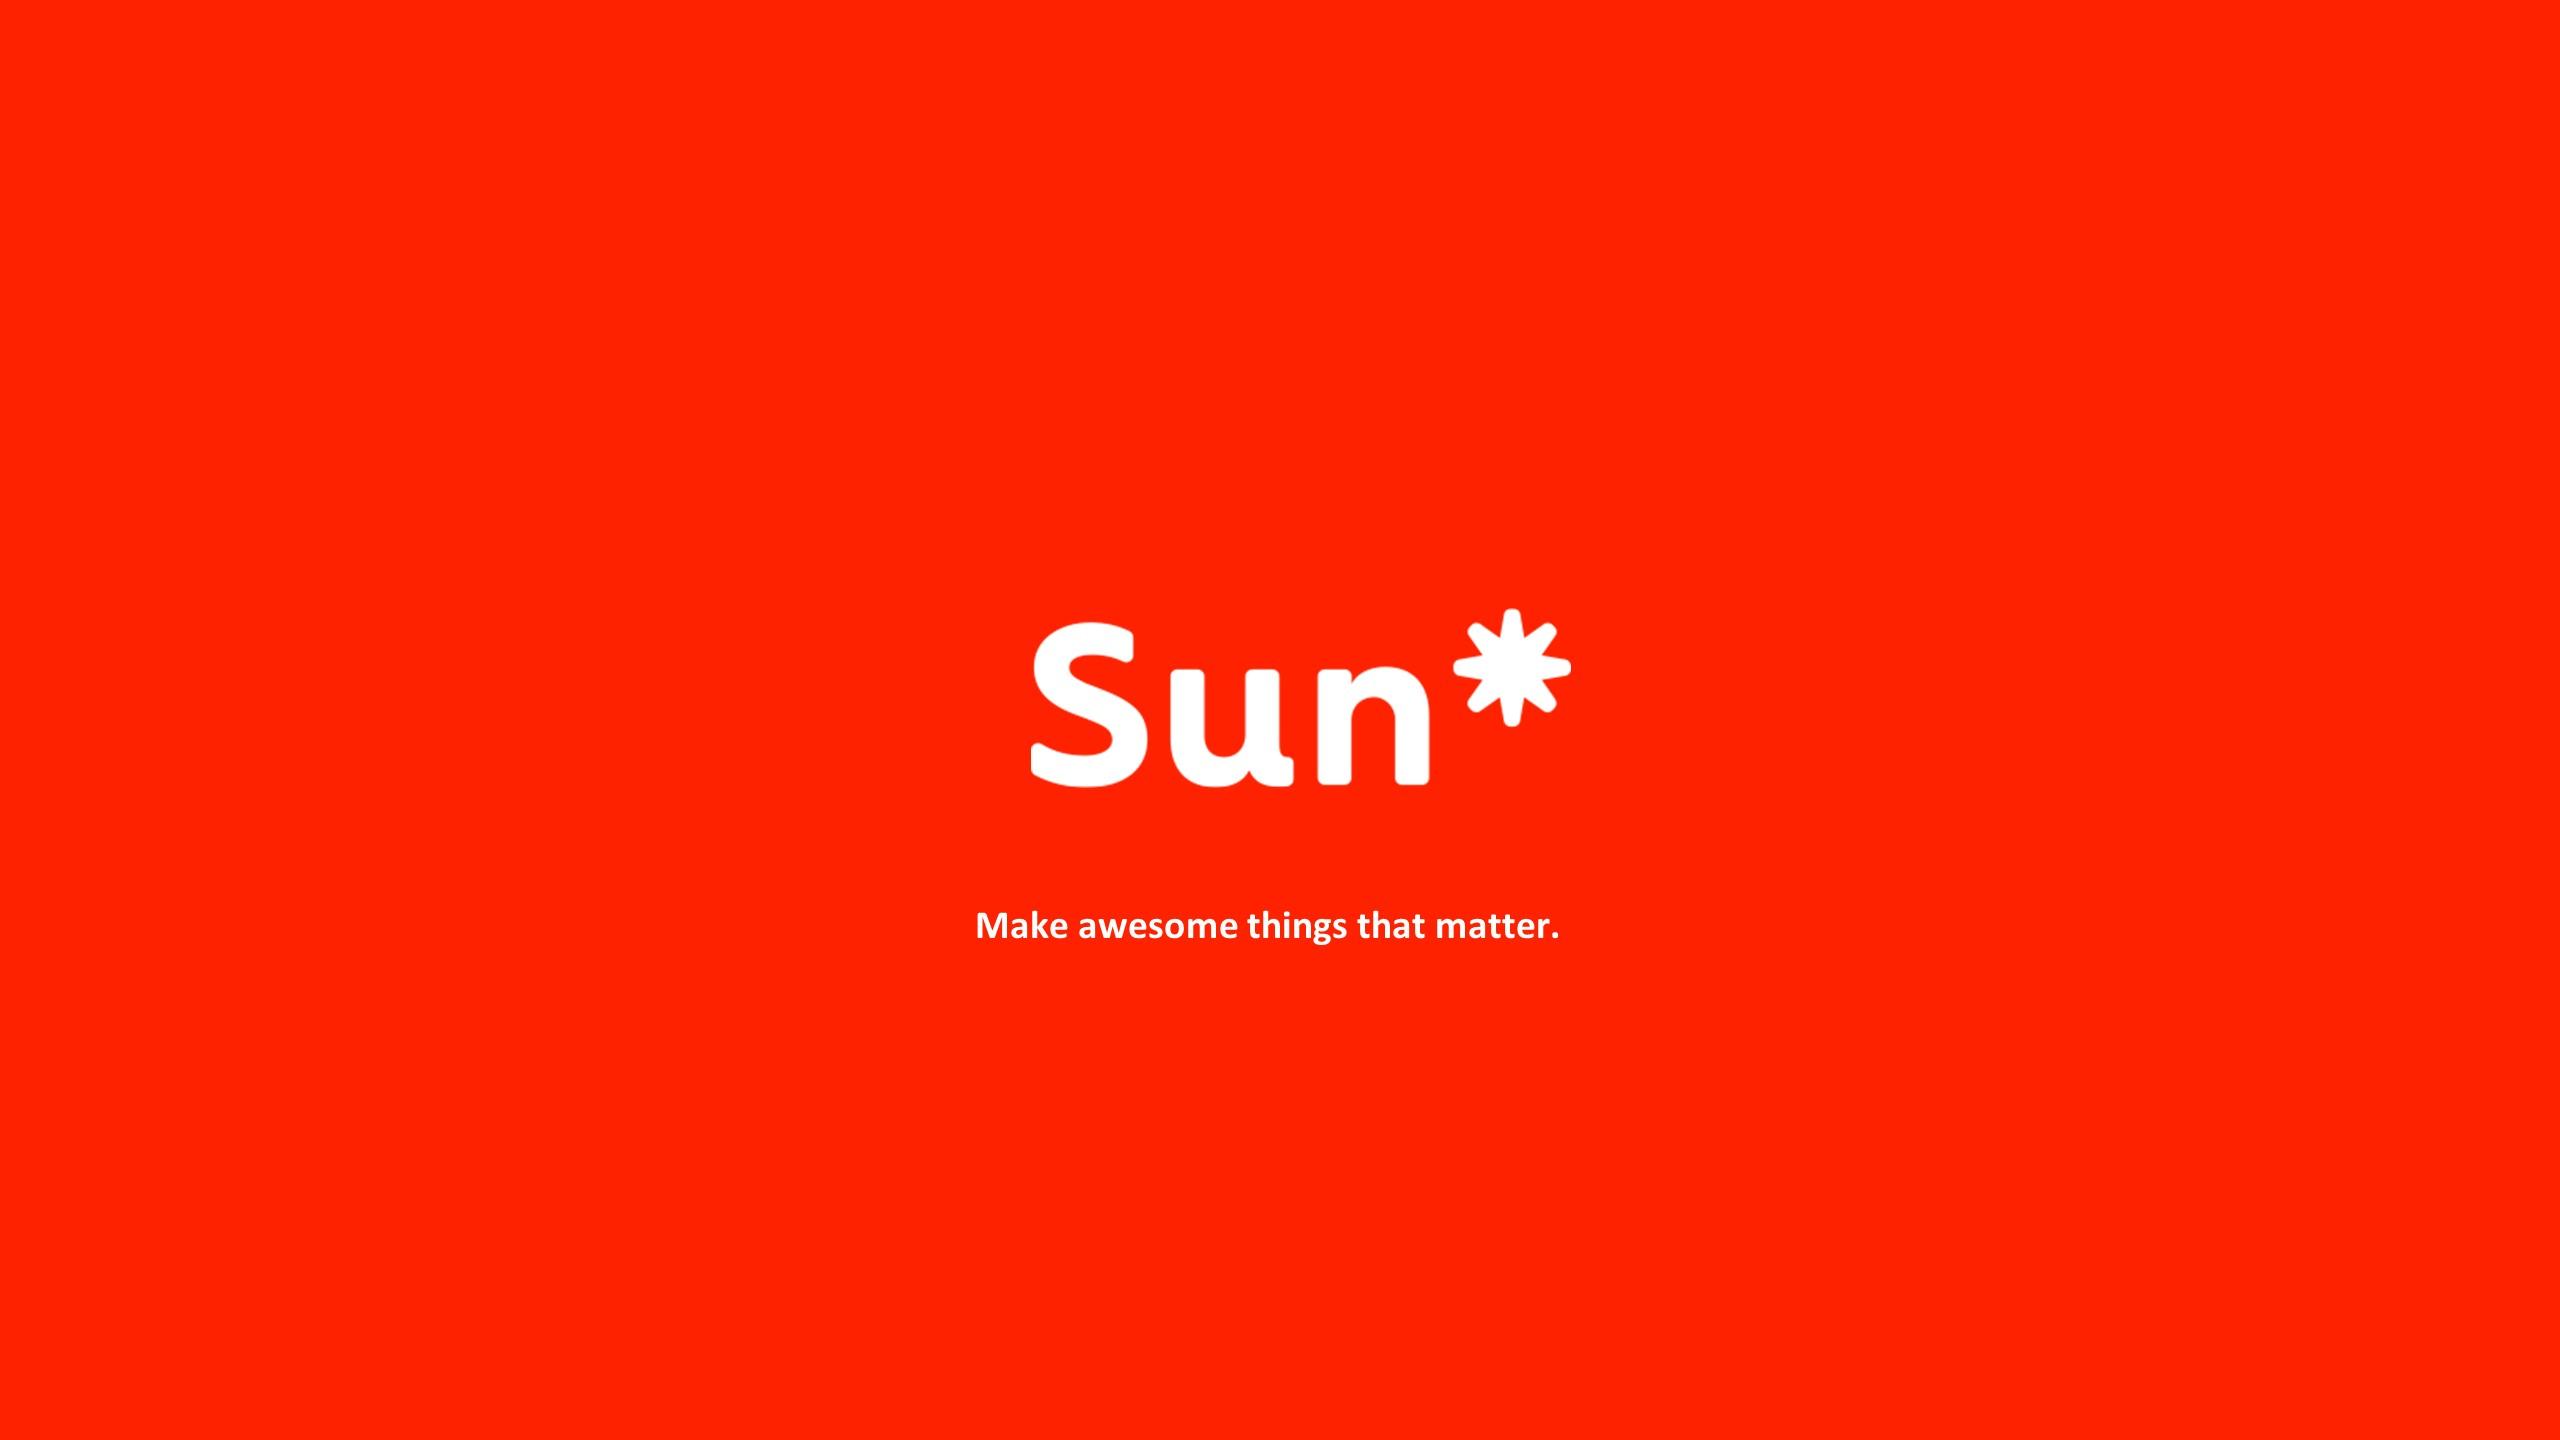 Sun*オープンポジション